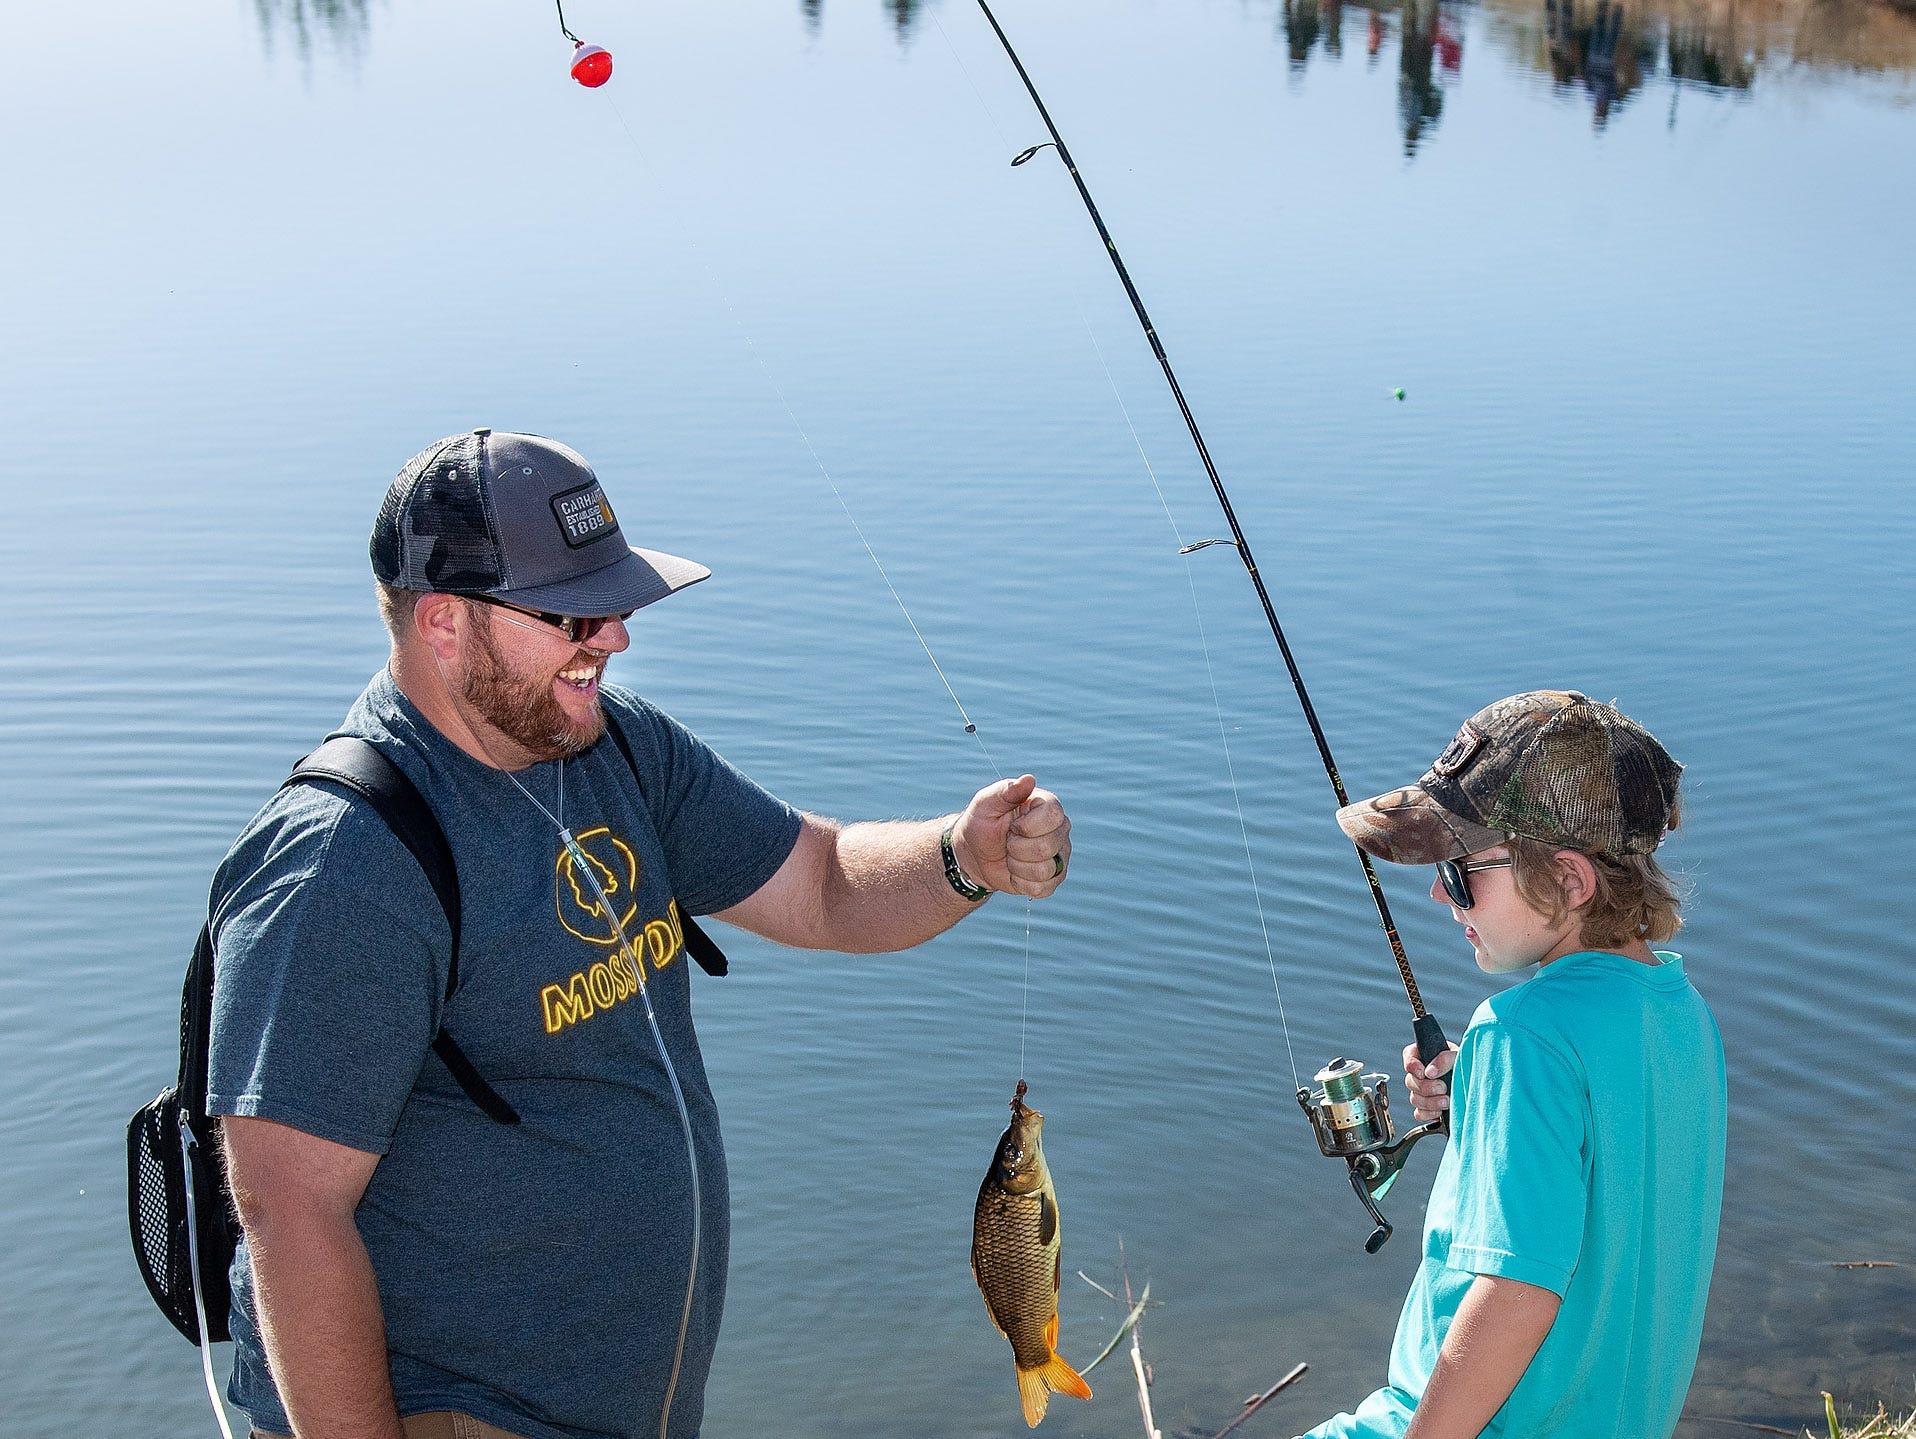 Layton Galvin, 9, and his stepdad Jason Booth examine LaytonÕs catch.